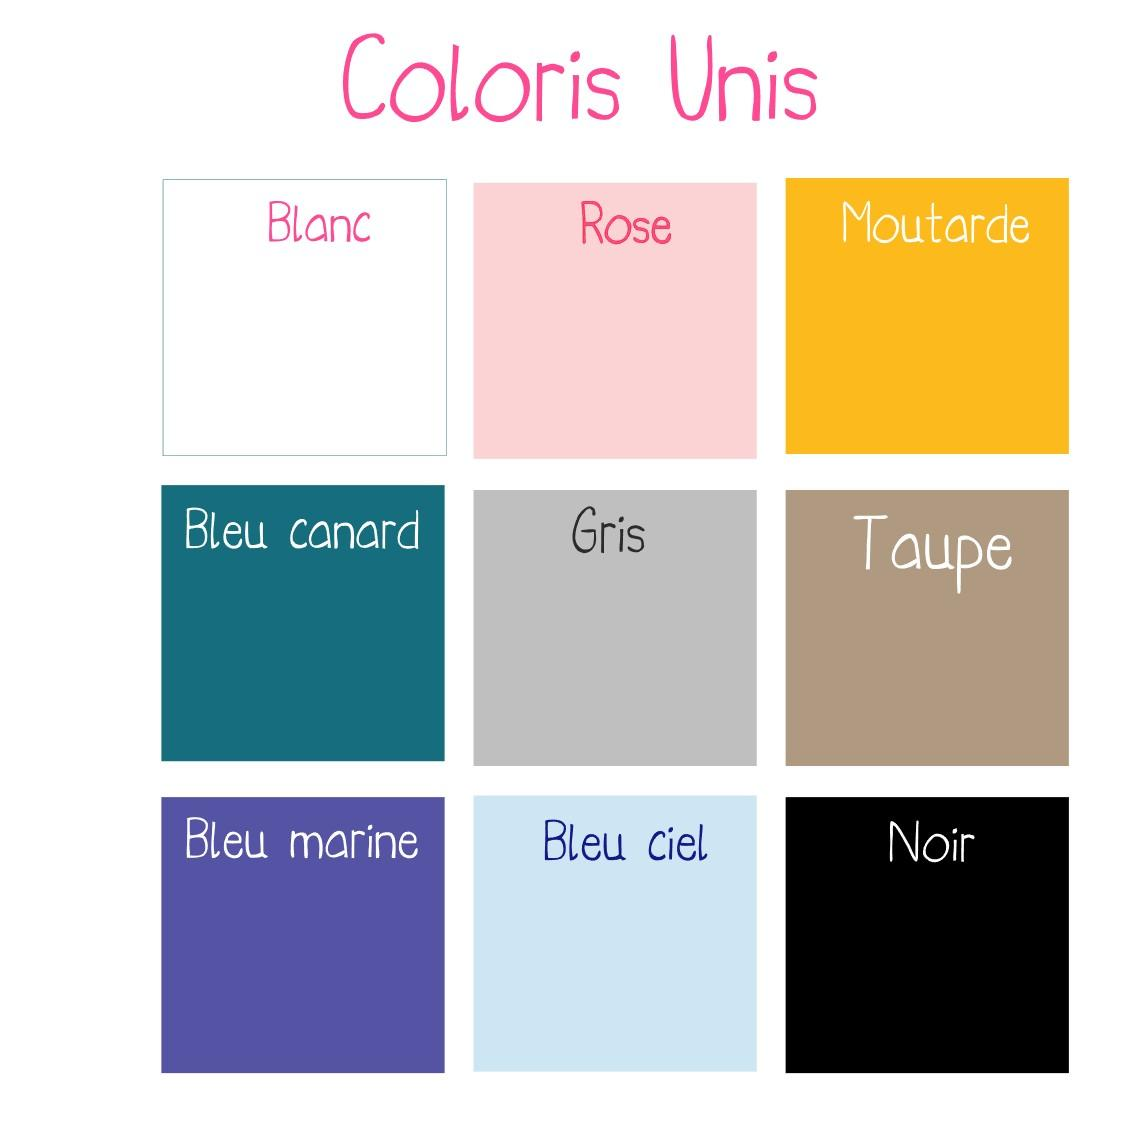 Coloris unis